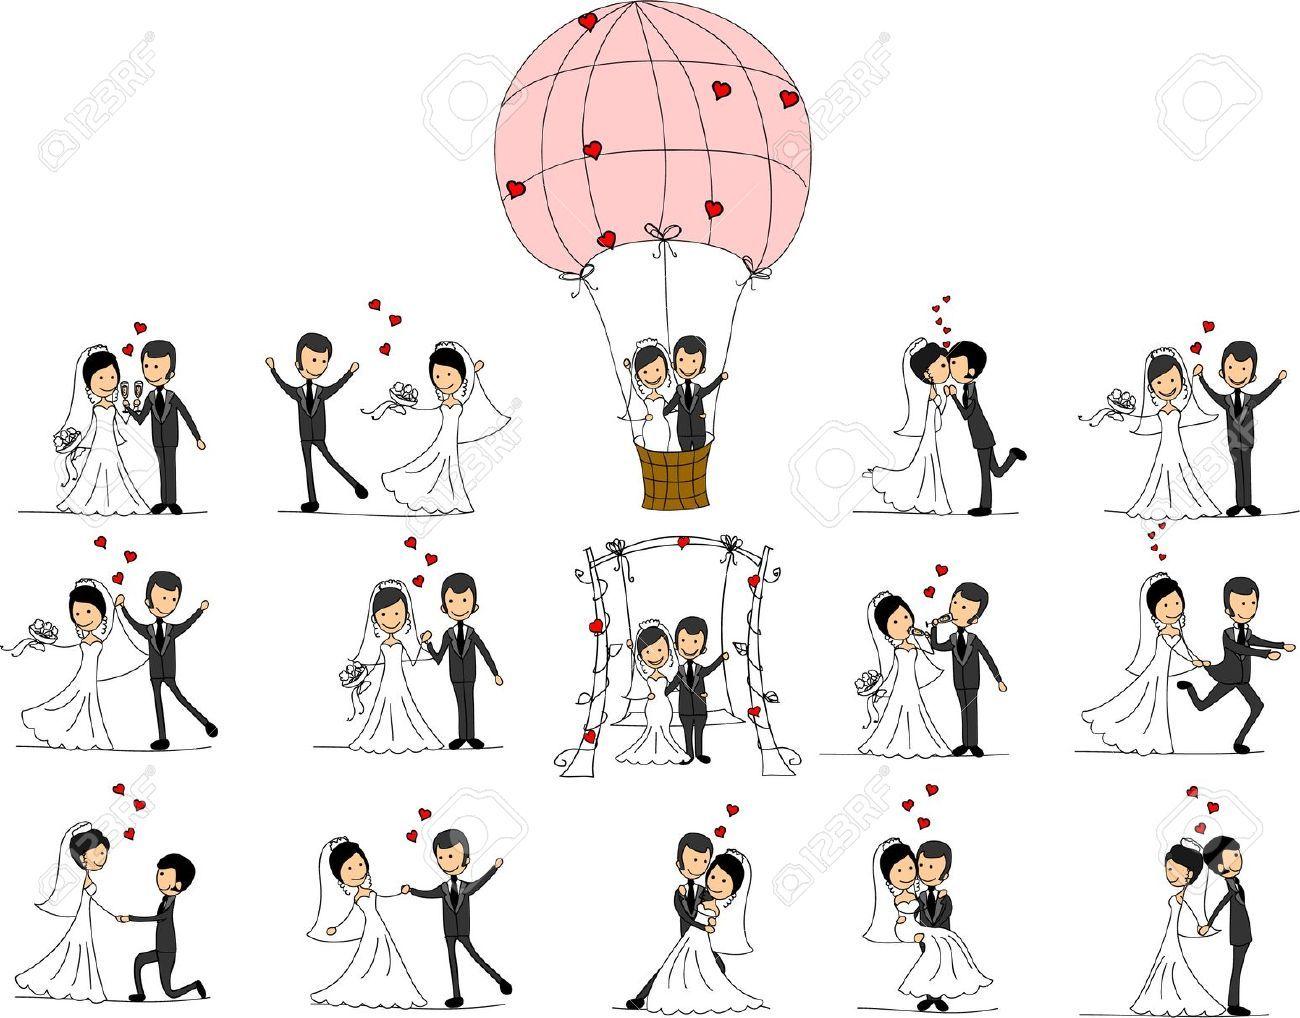 Cartoon Wedding Vectors Photos and PSD files